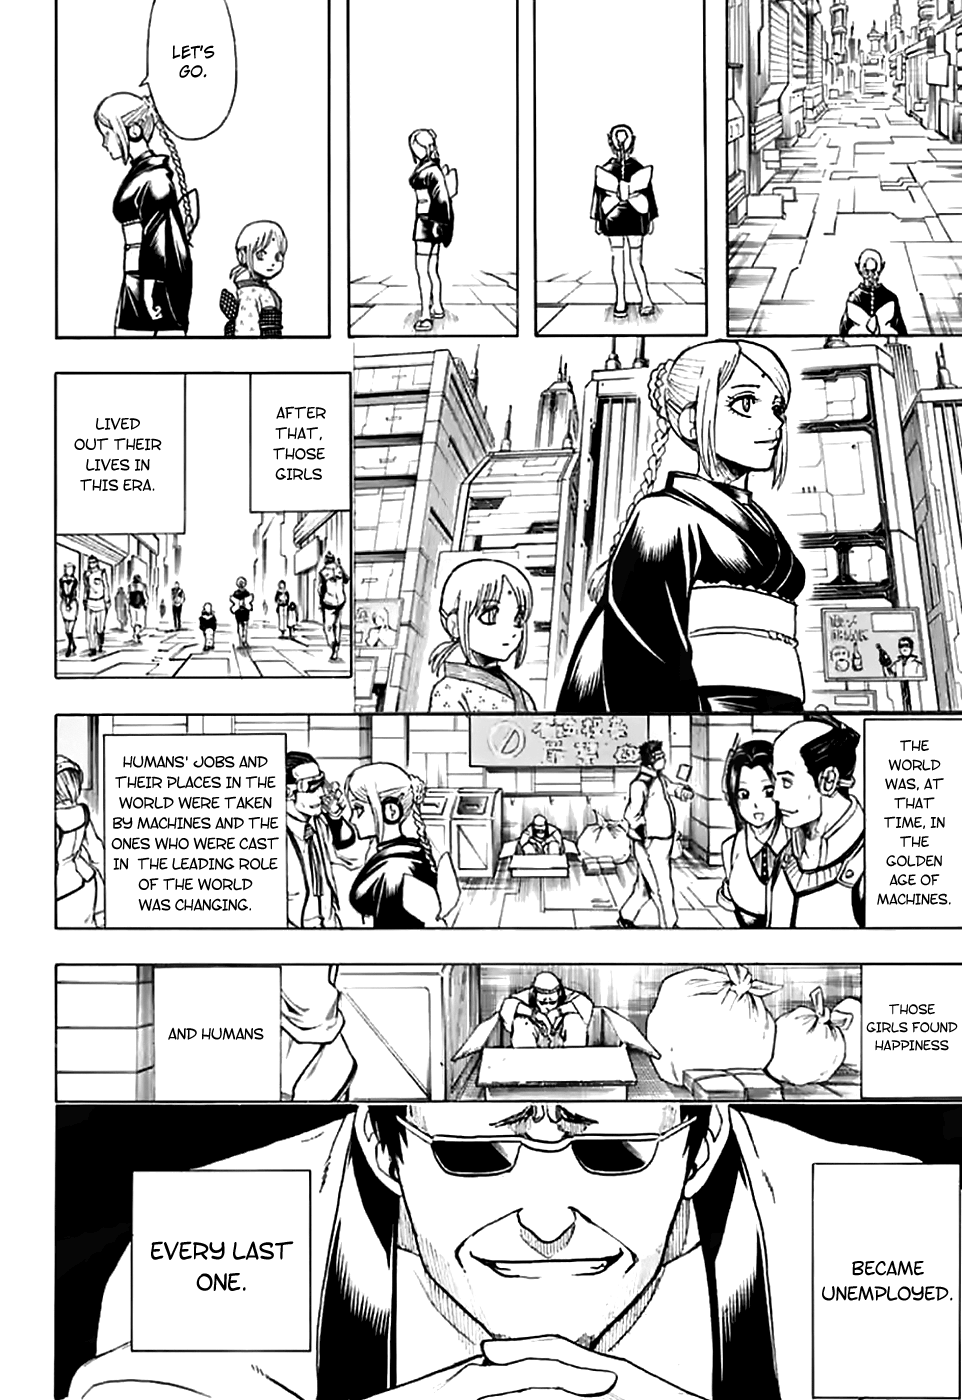 Gintama Chapter 704  Online Free Manga Read Image 56